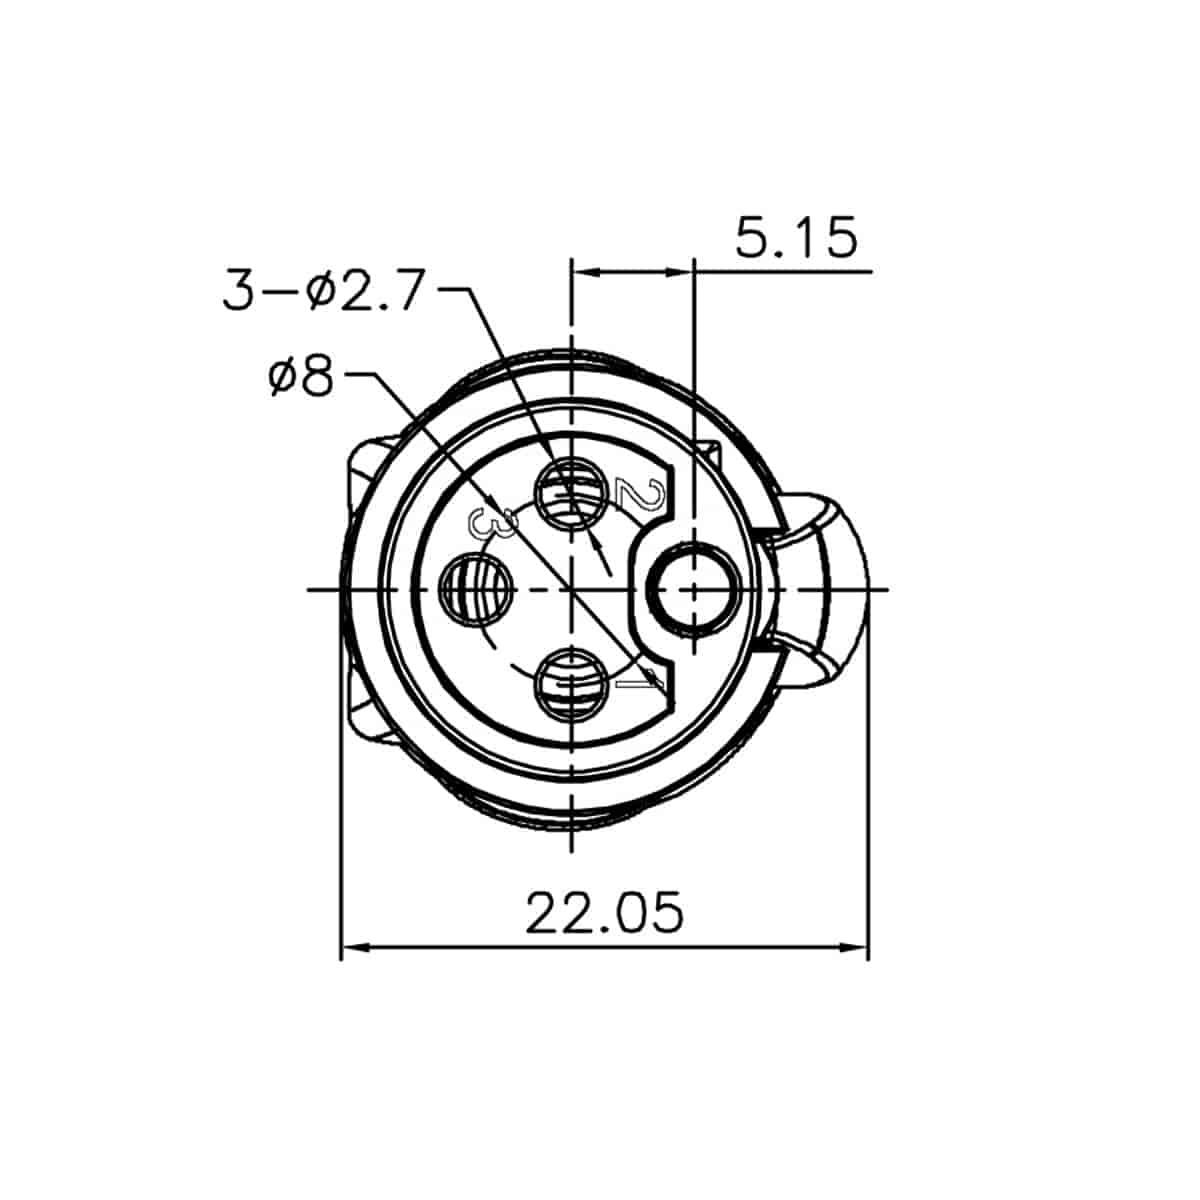 Enova Outdoor Xlr Cable Socket Ip67 3 Pol Solder